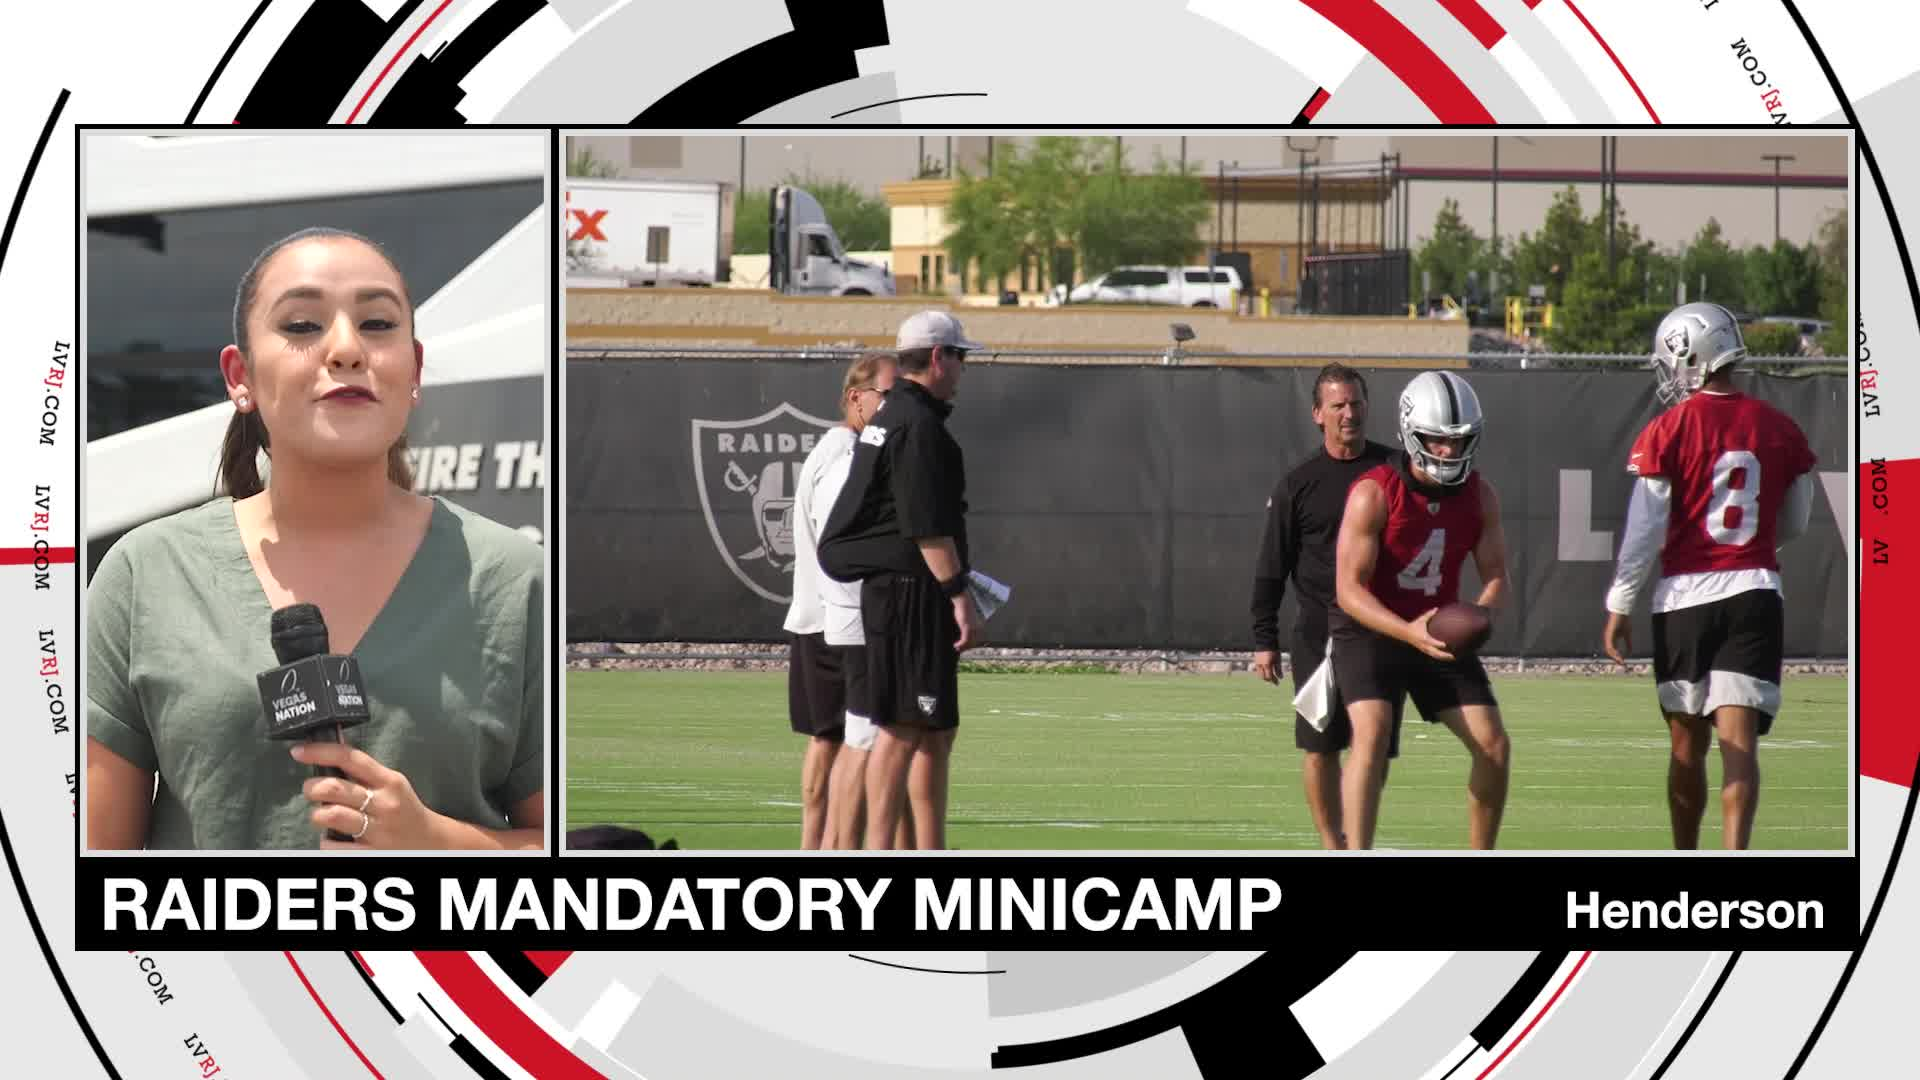 Raiders Mandatory Minicamp